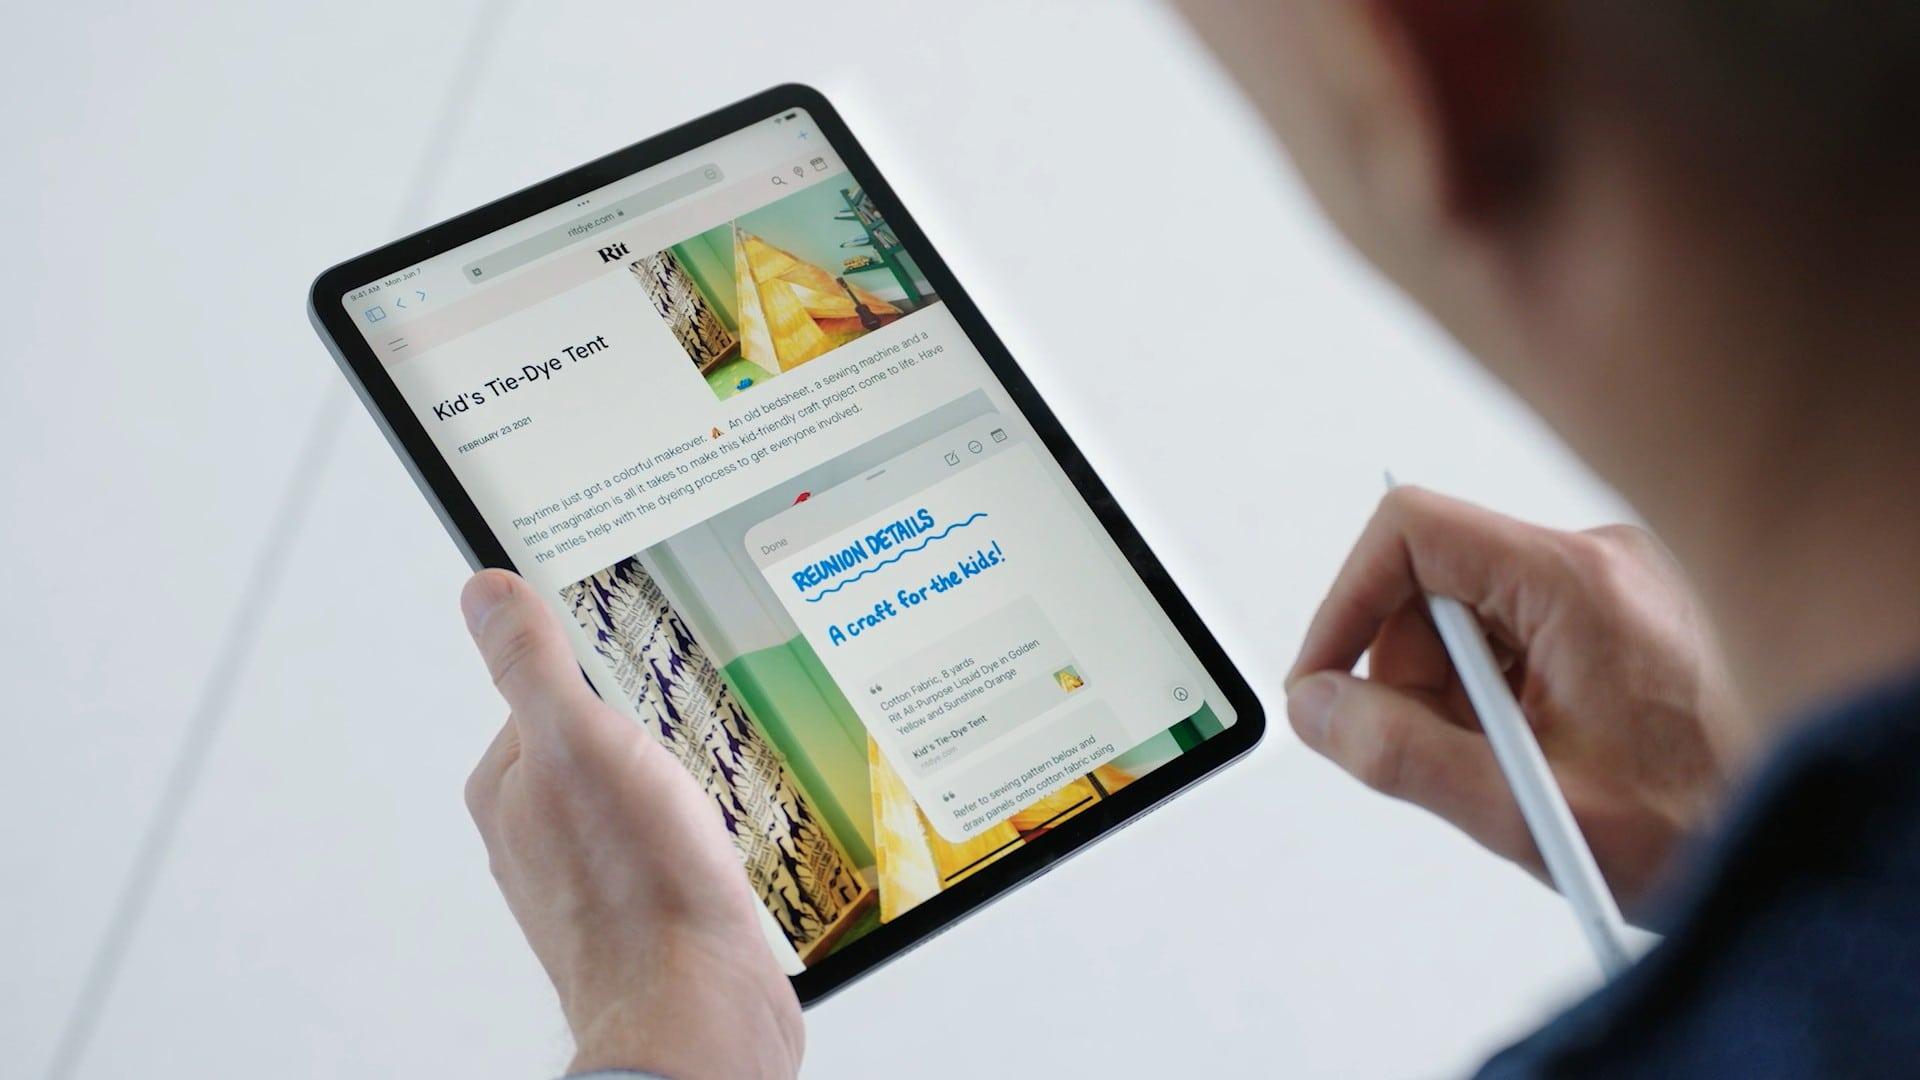 QuickNote in iPadOS 15